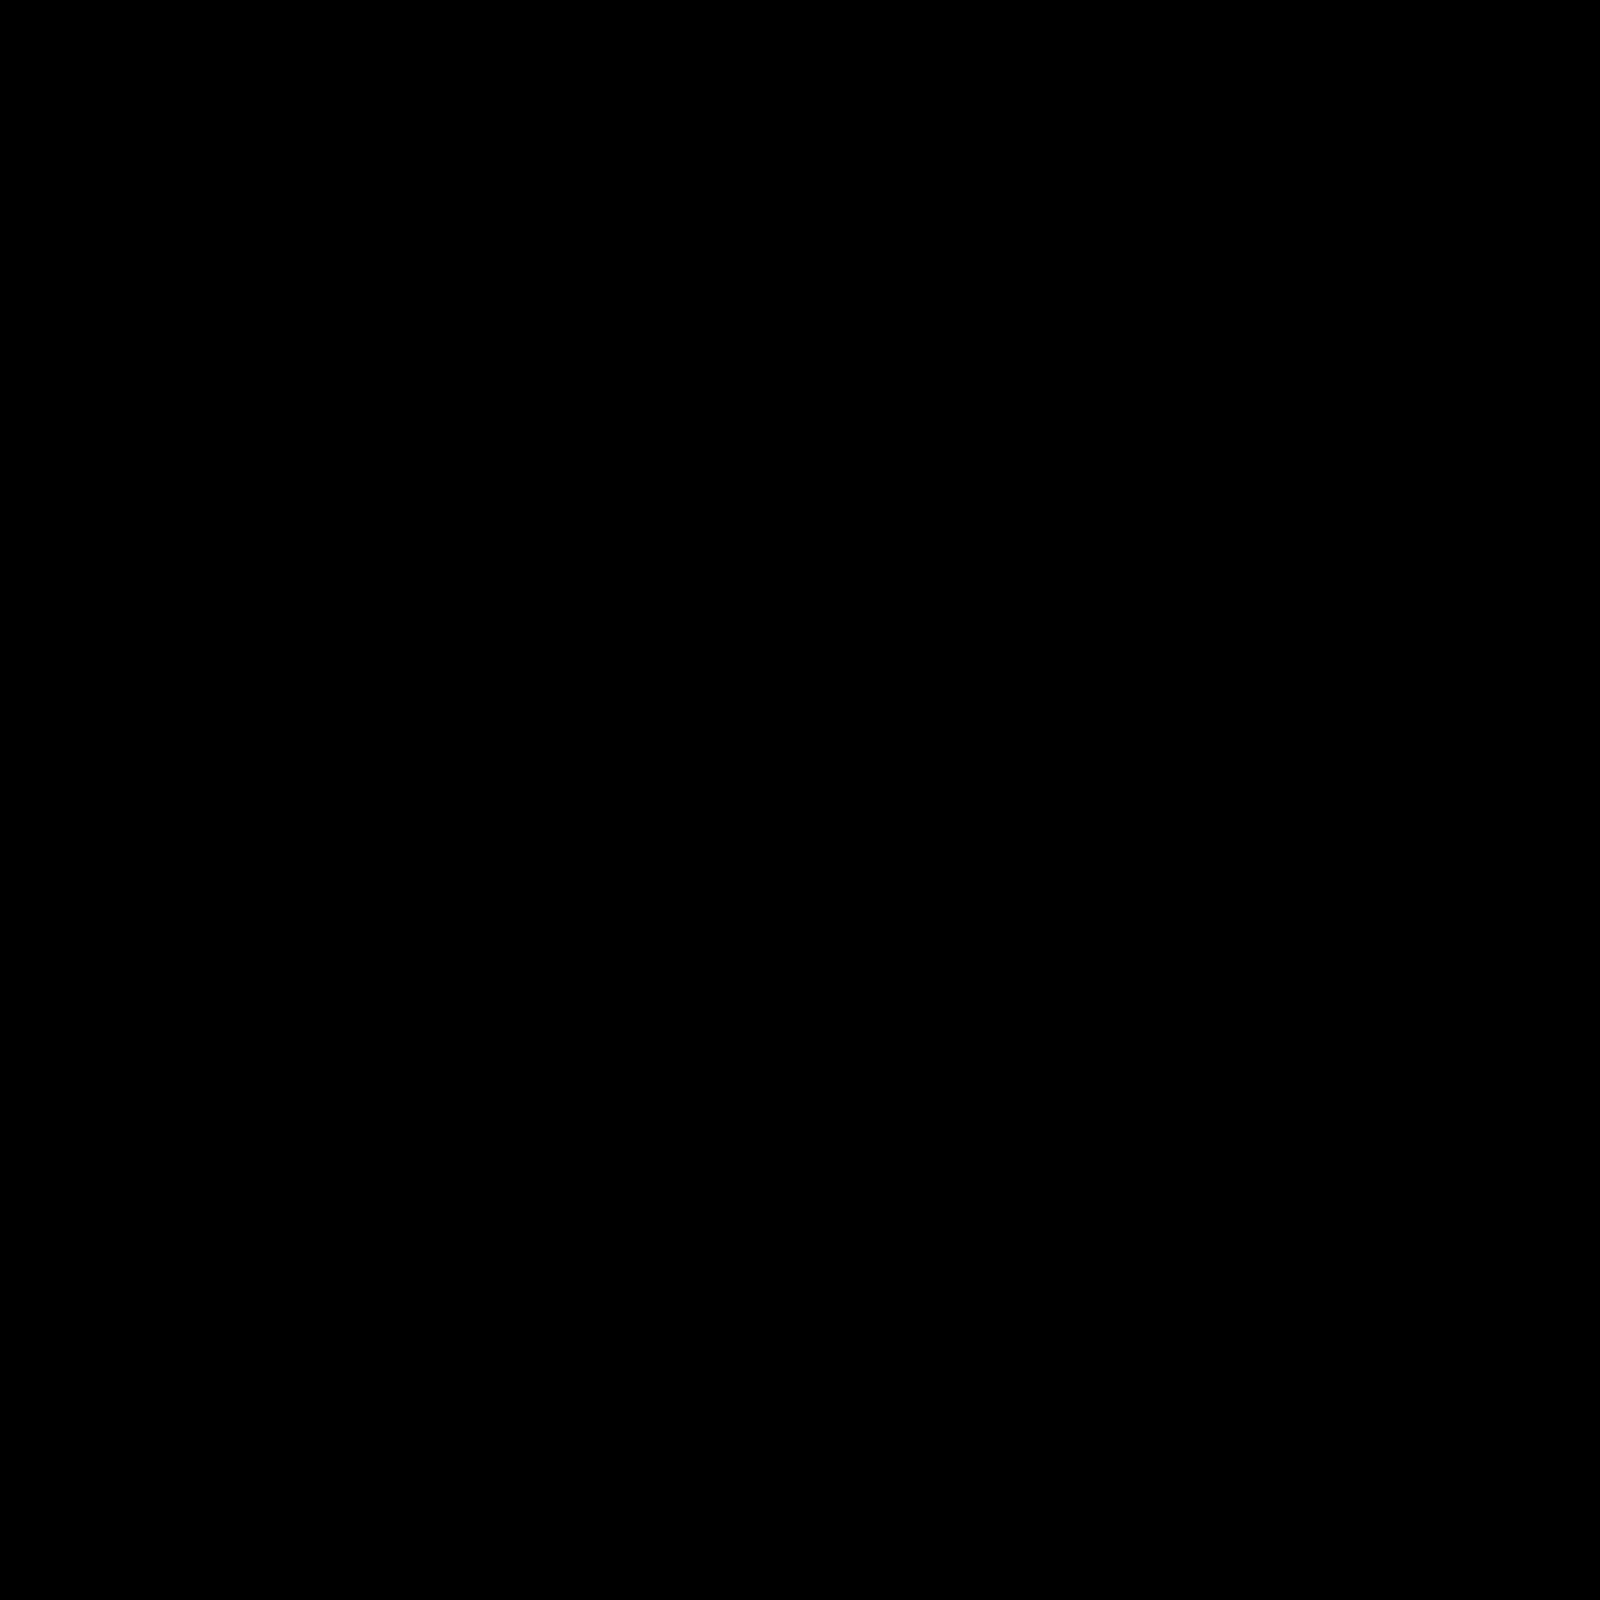 Désodorisant icon